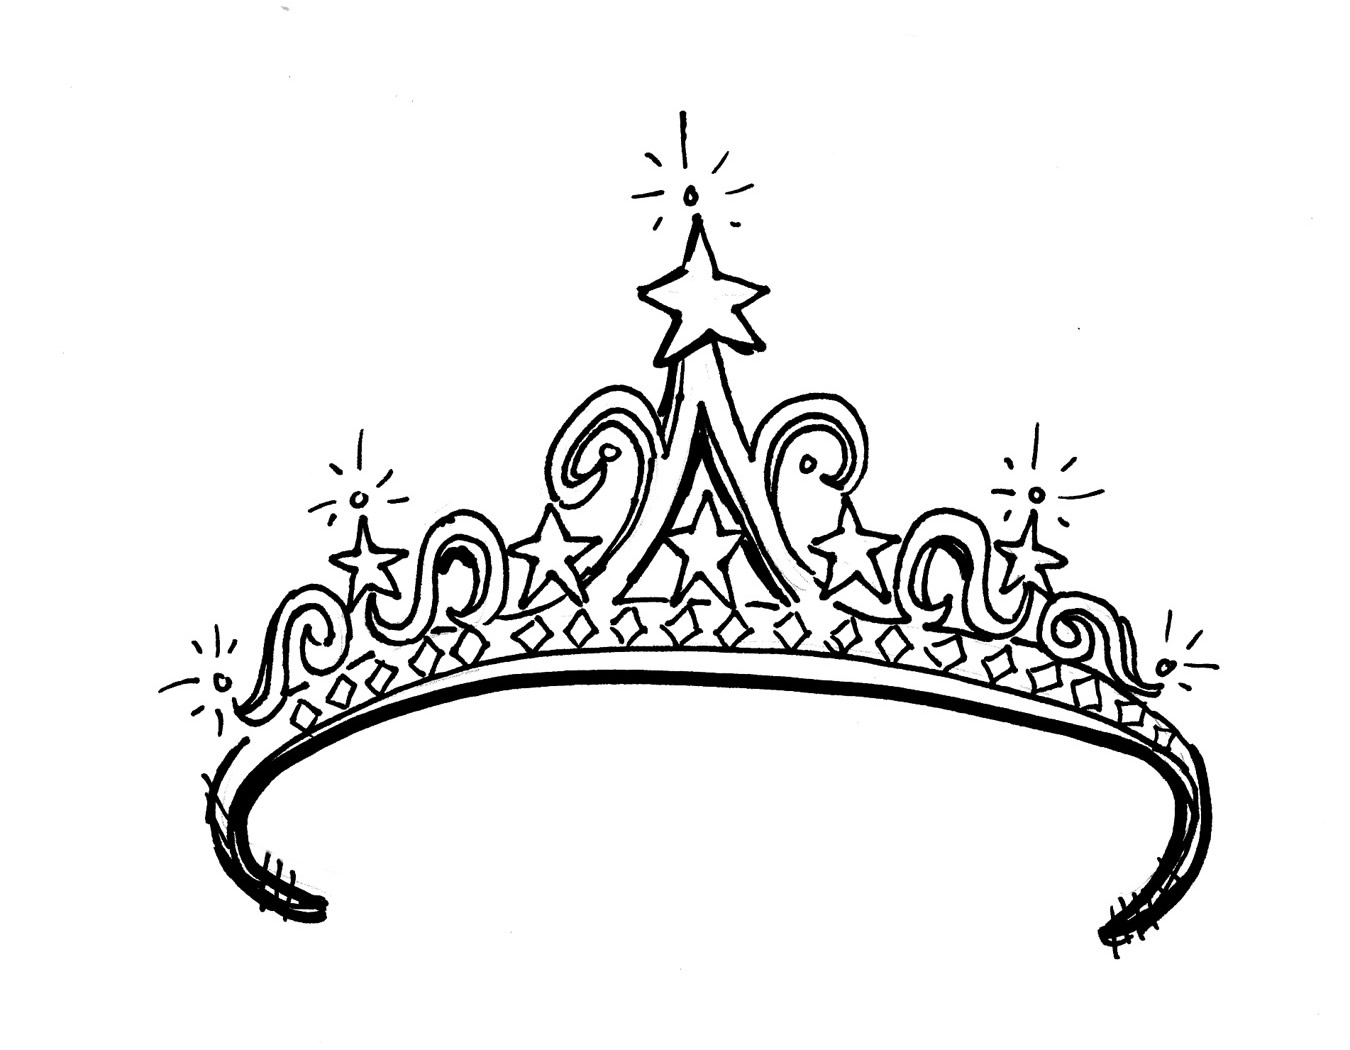 Tiara And Crowns Cartoon-Tiara And Crowns Cartoon-7